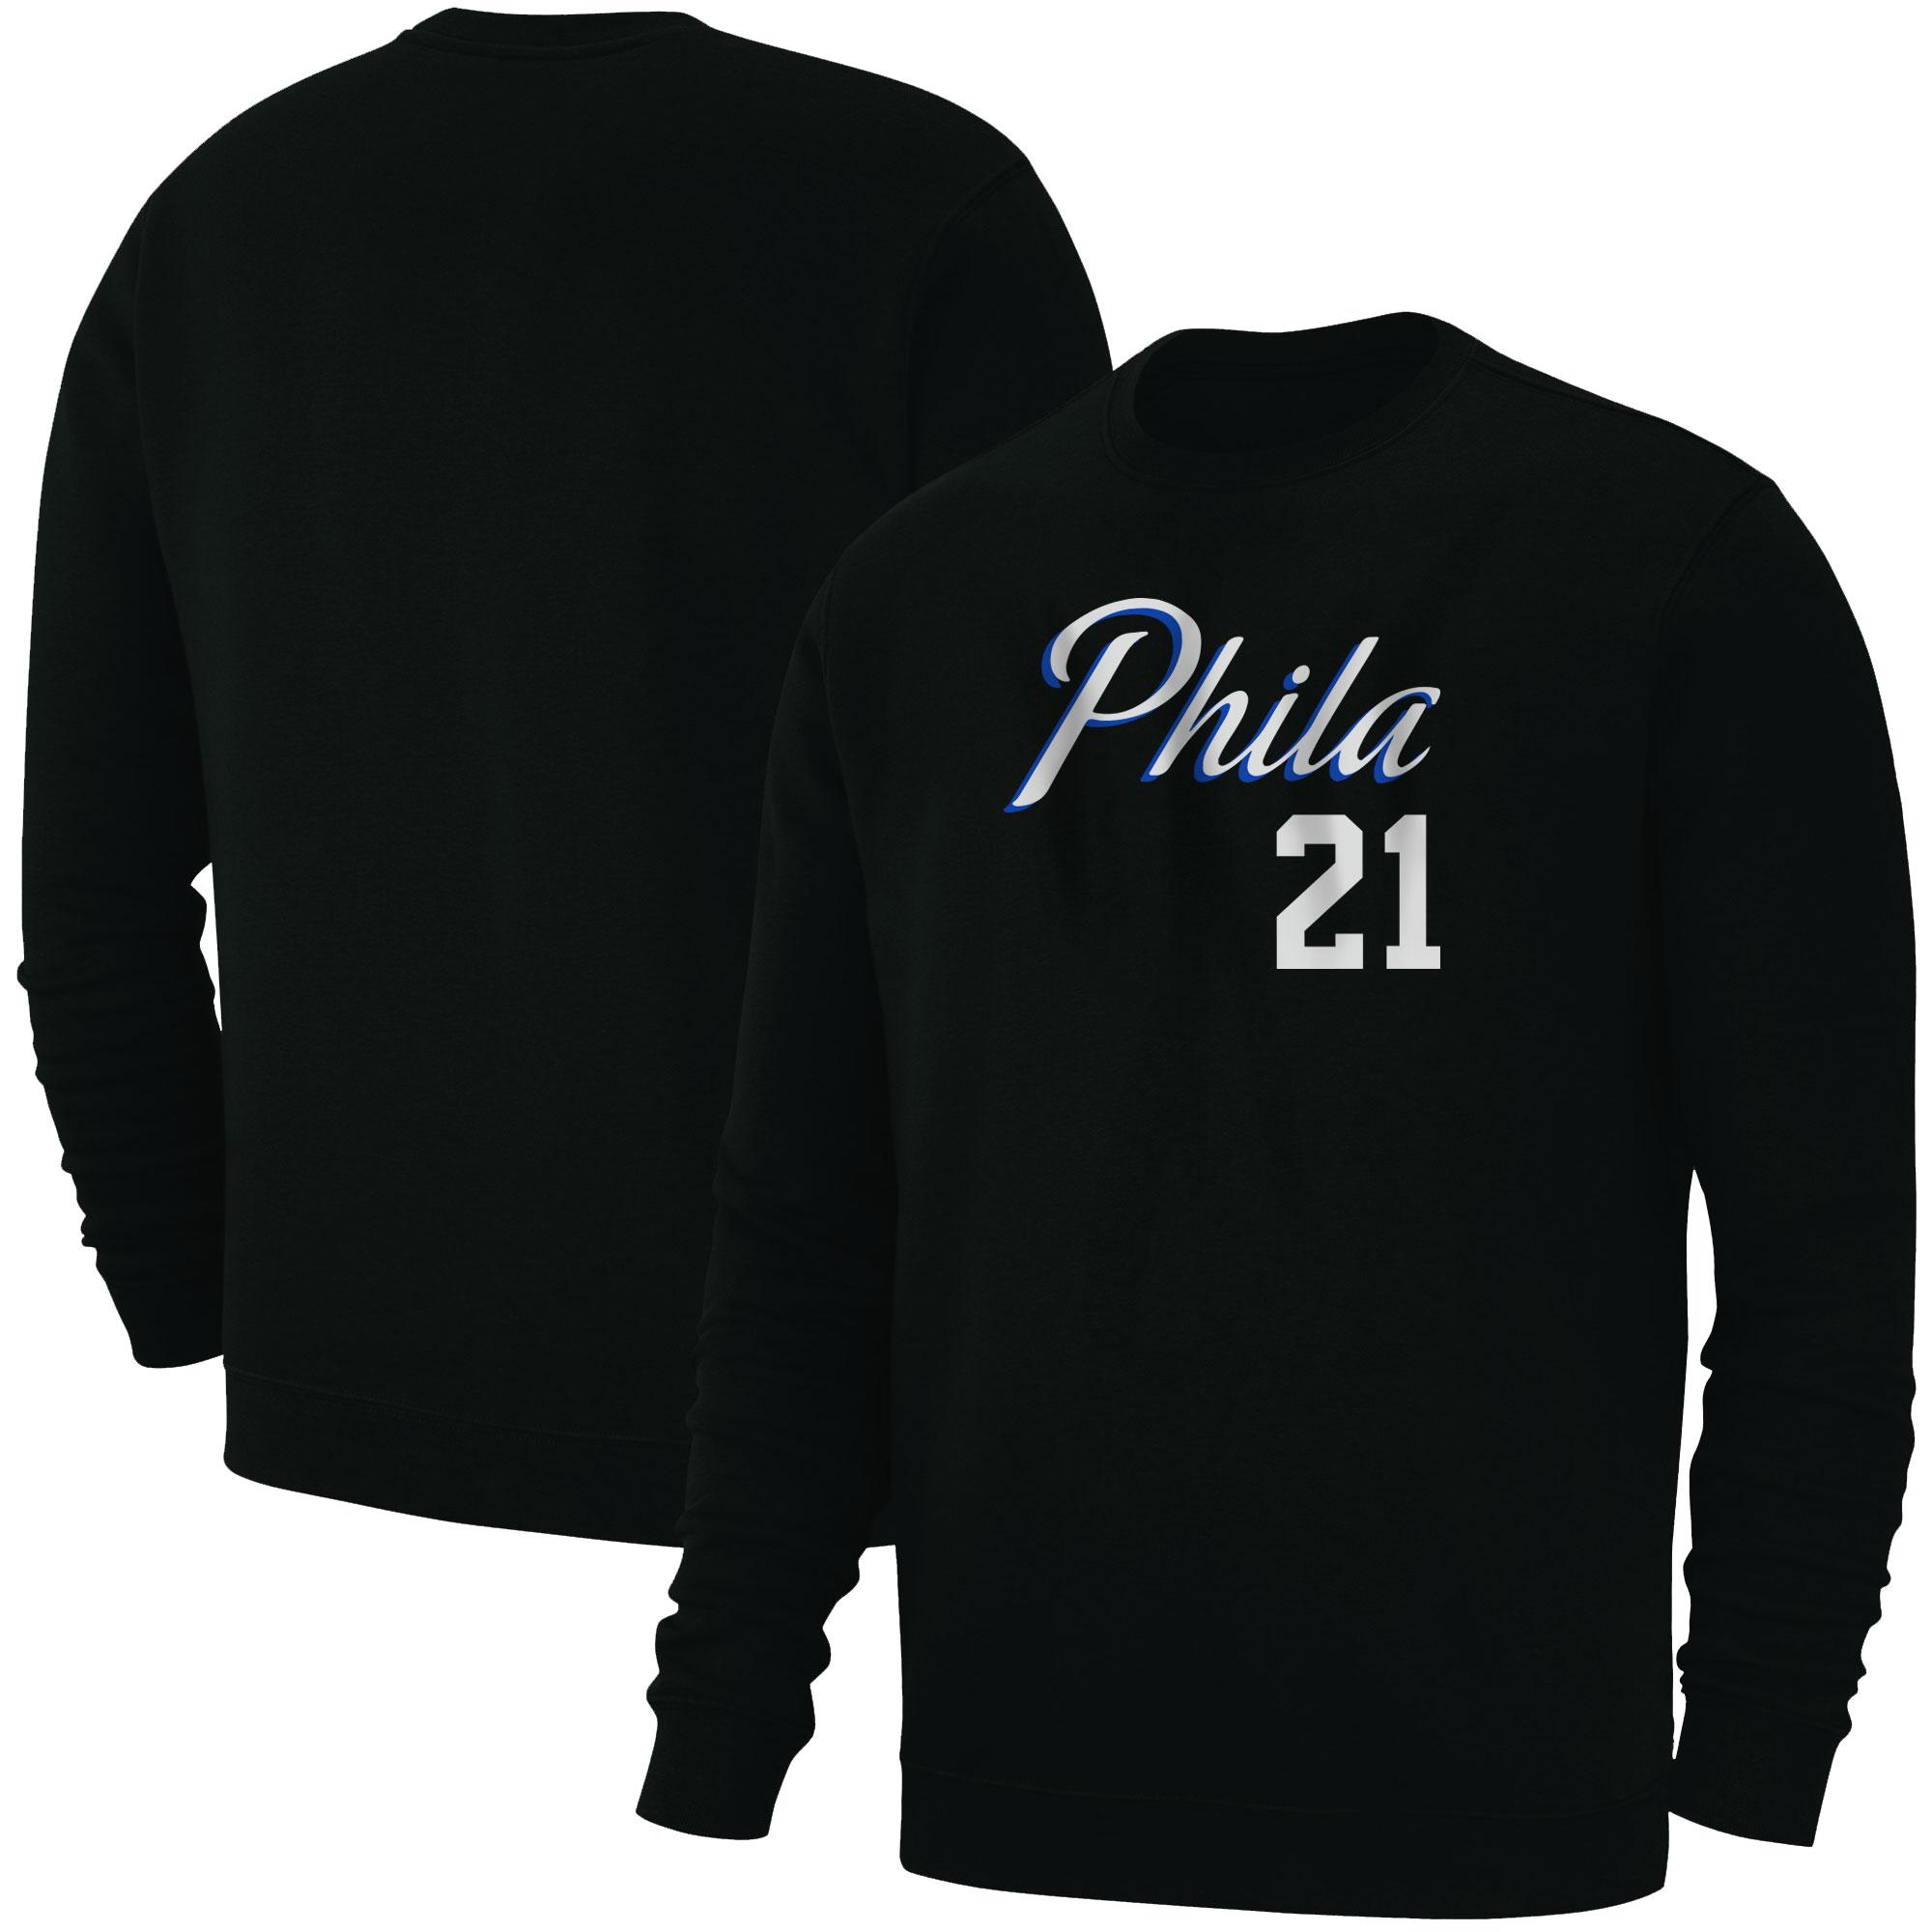 Philadelphia 76ers Joel Embiid Basic (BSC-BLC-PLT-504-21)